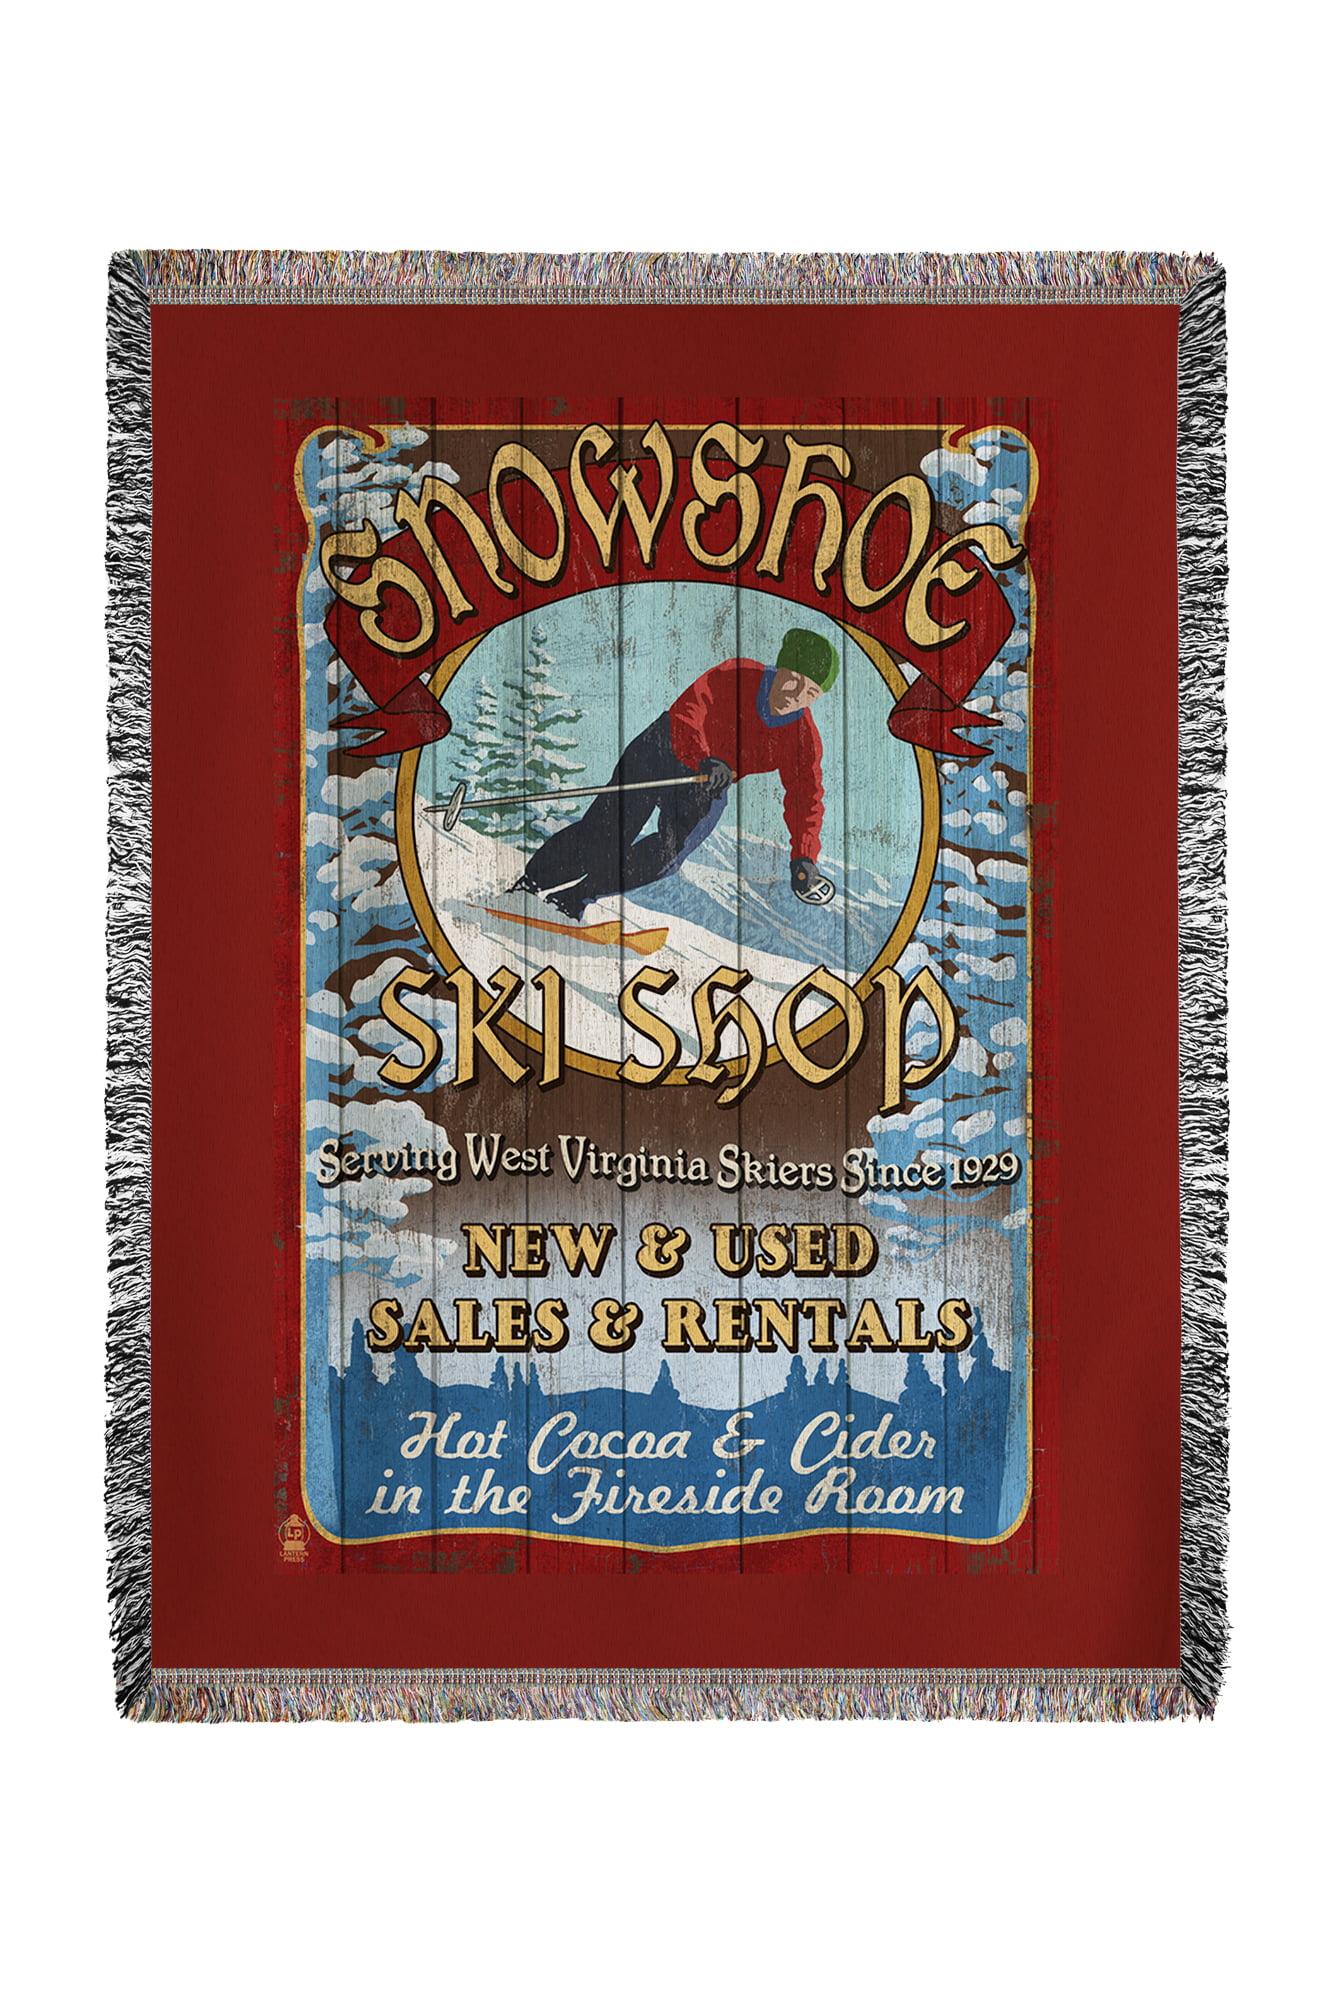 Snowshoe, West Virginia Ski Shop Vintage Sign Lantern Press Artwork (60x80 Woven Chenille Yarn Blanket) by Lantern Press